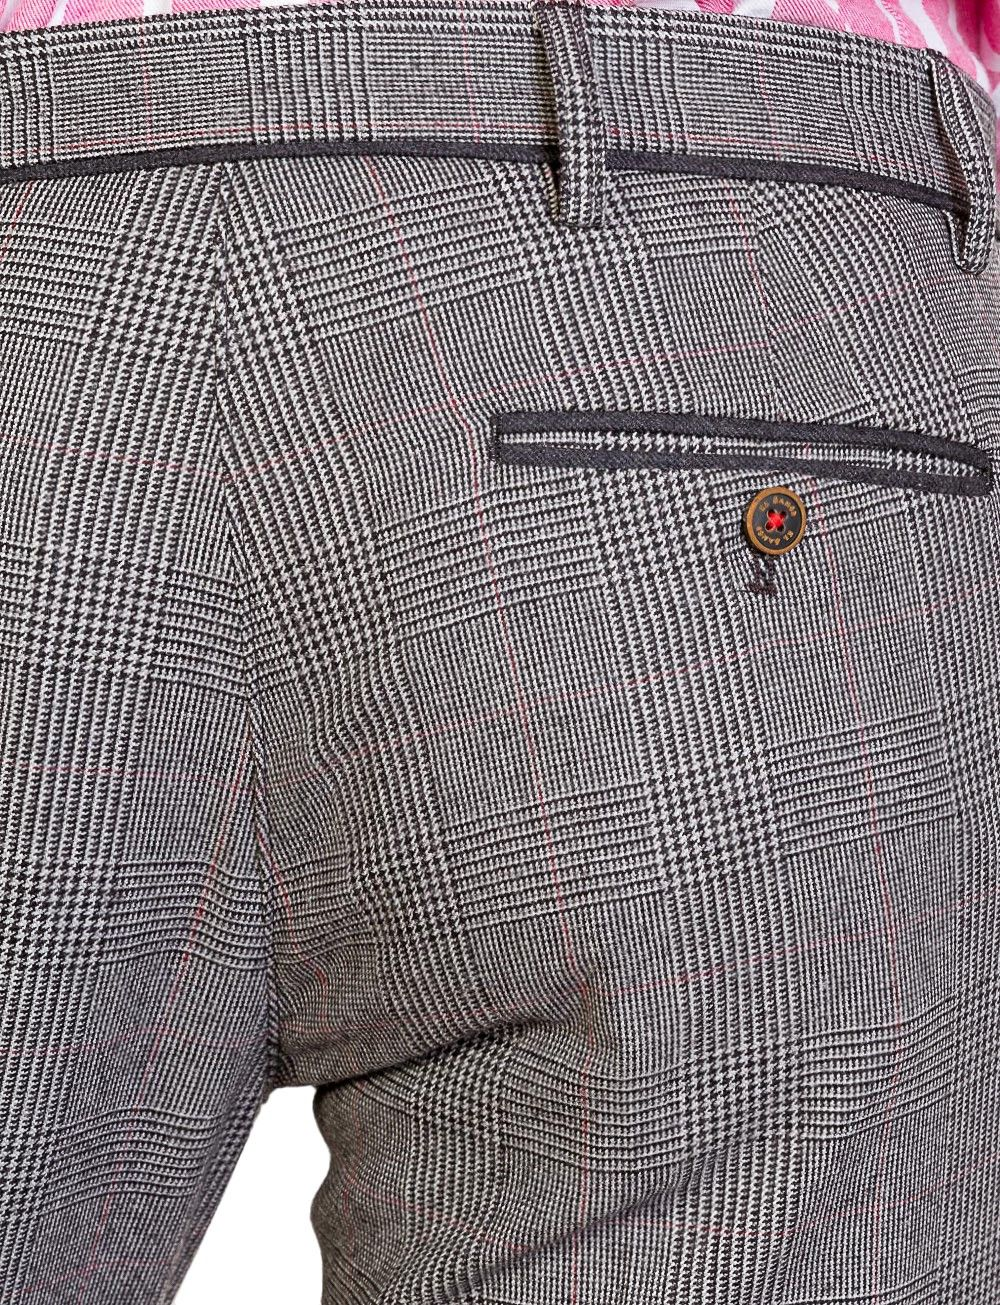 298819d6d1c19 Pantalón Cuadro Gales Gris Marengo Subalpino   El Ganso Online Store ...